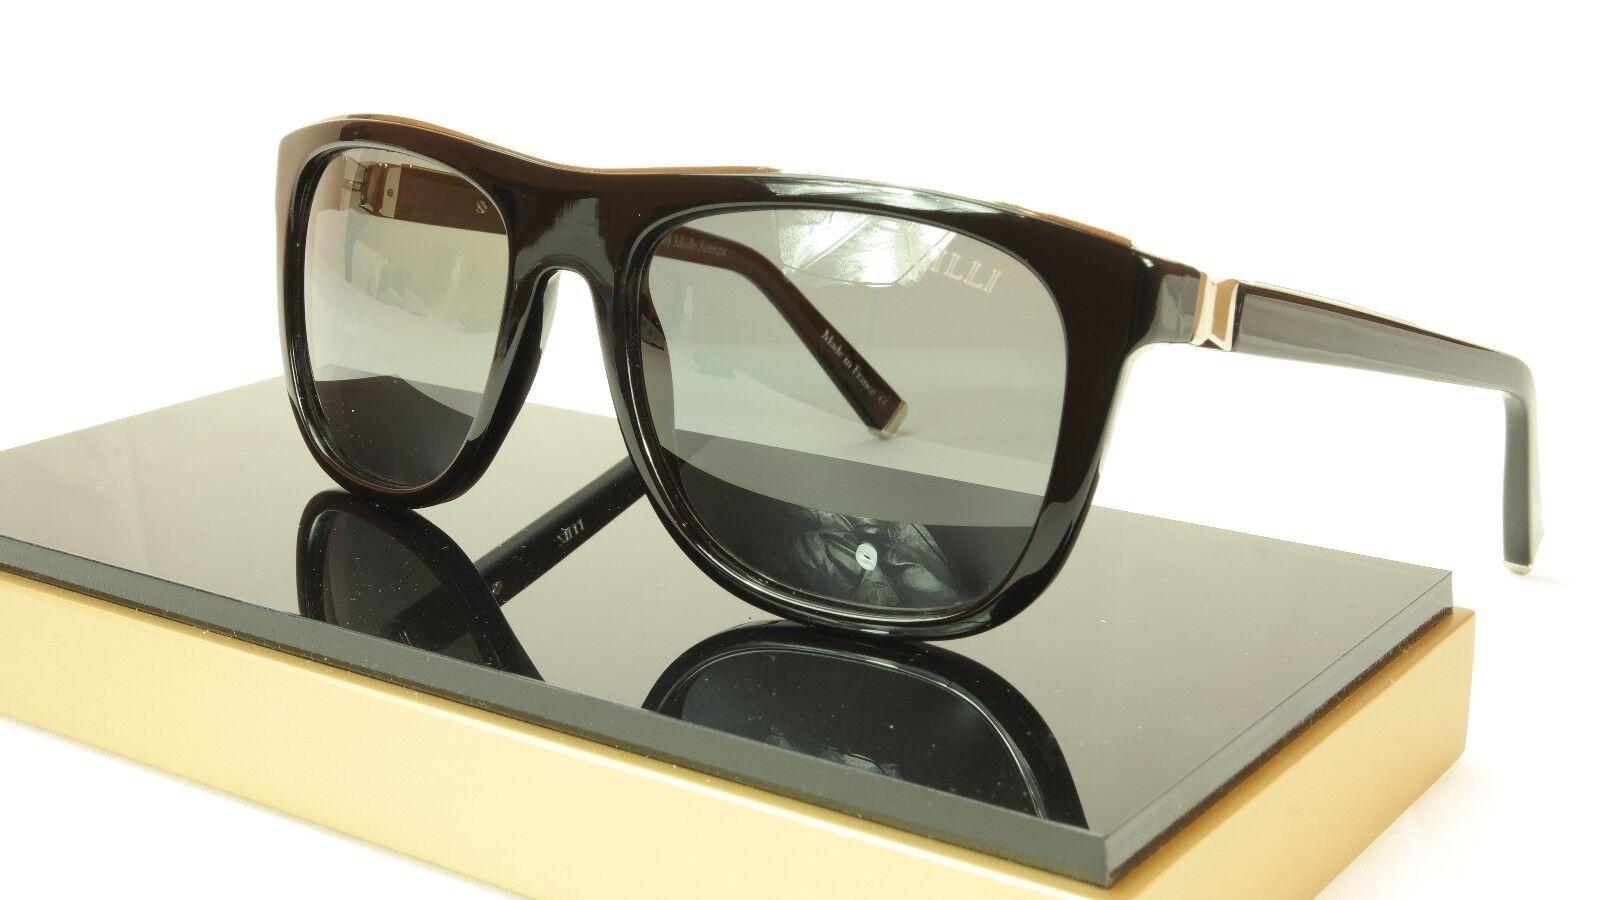 f7799e109de ZILLI Sunglasses Polarized Black Hand Made Acetate Titanium France ZI 65004  C03 фото